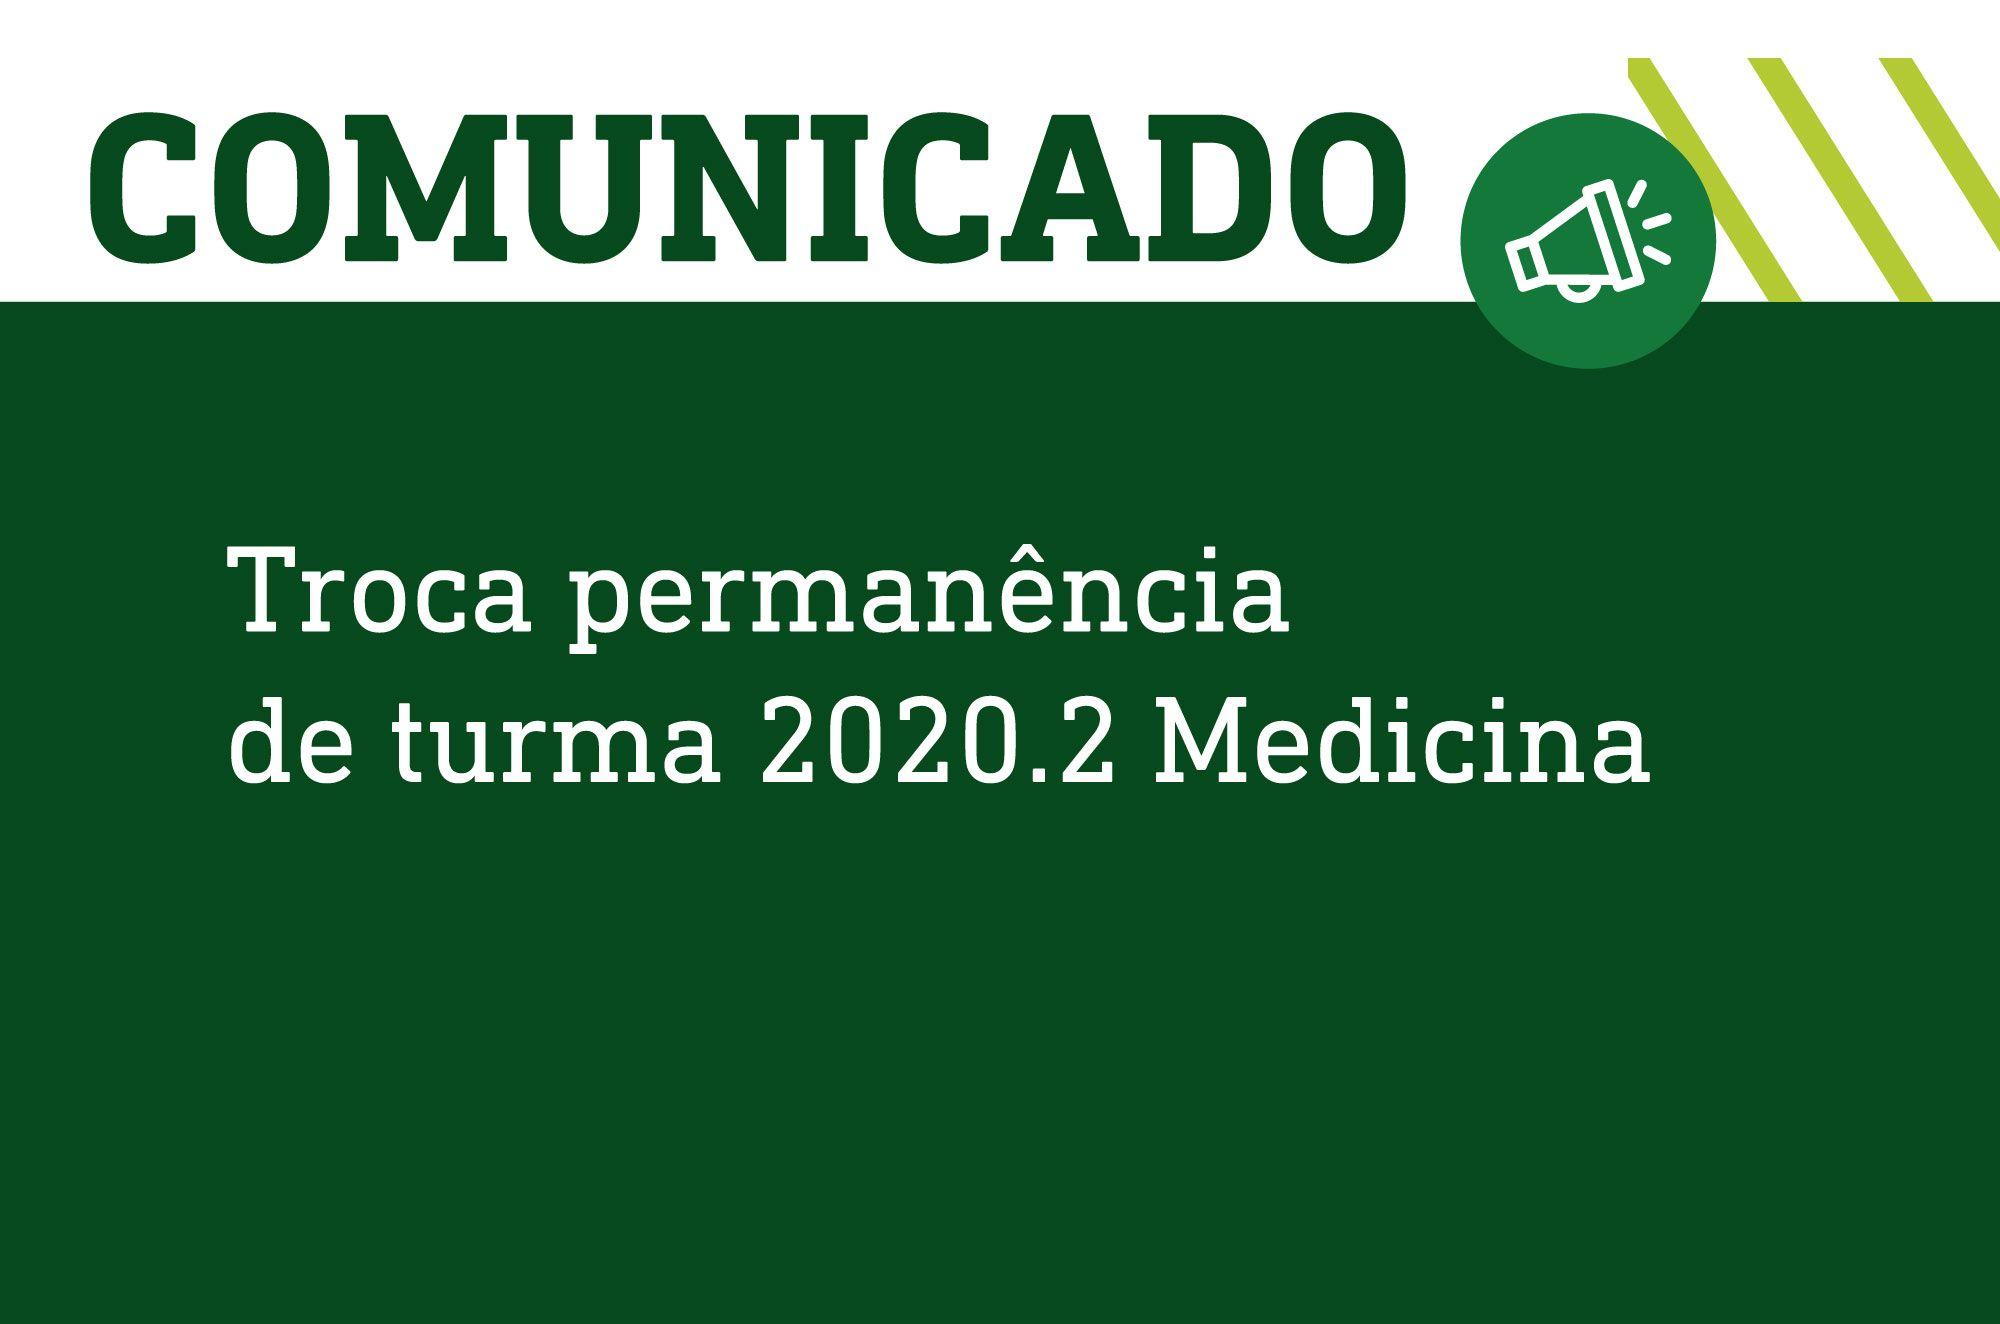 Troca ou permanência de turma 2020.2 Medicina